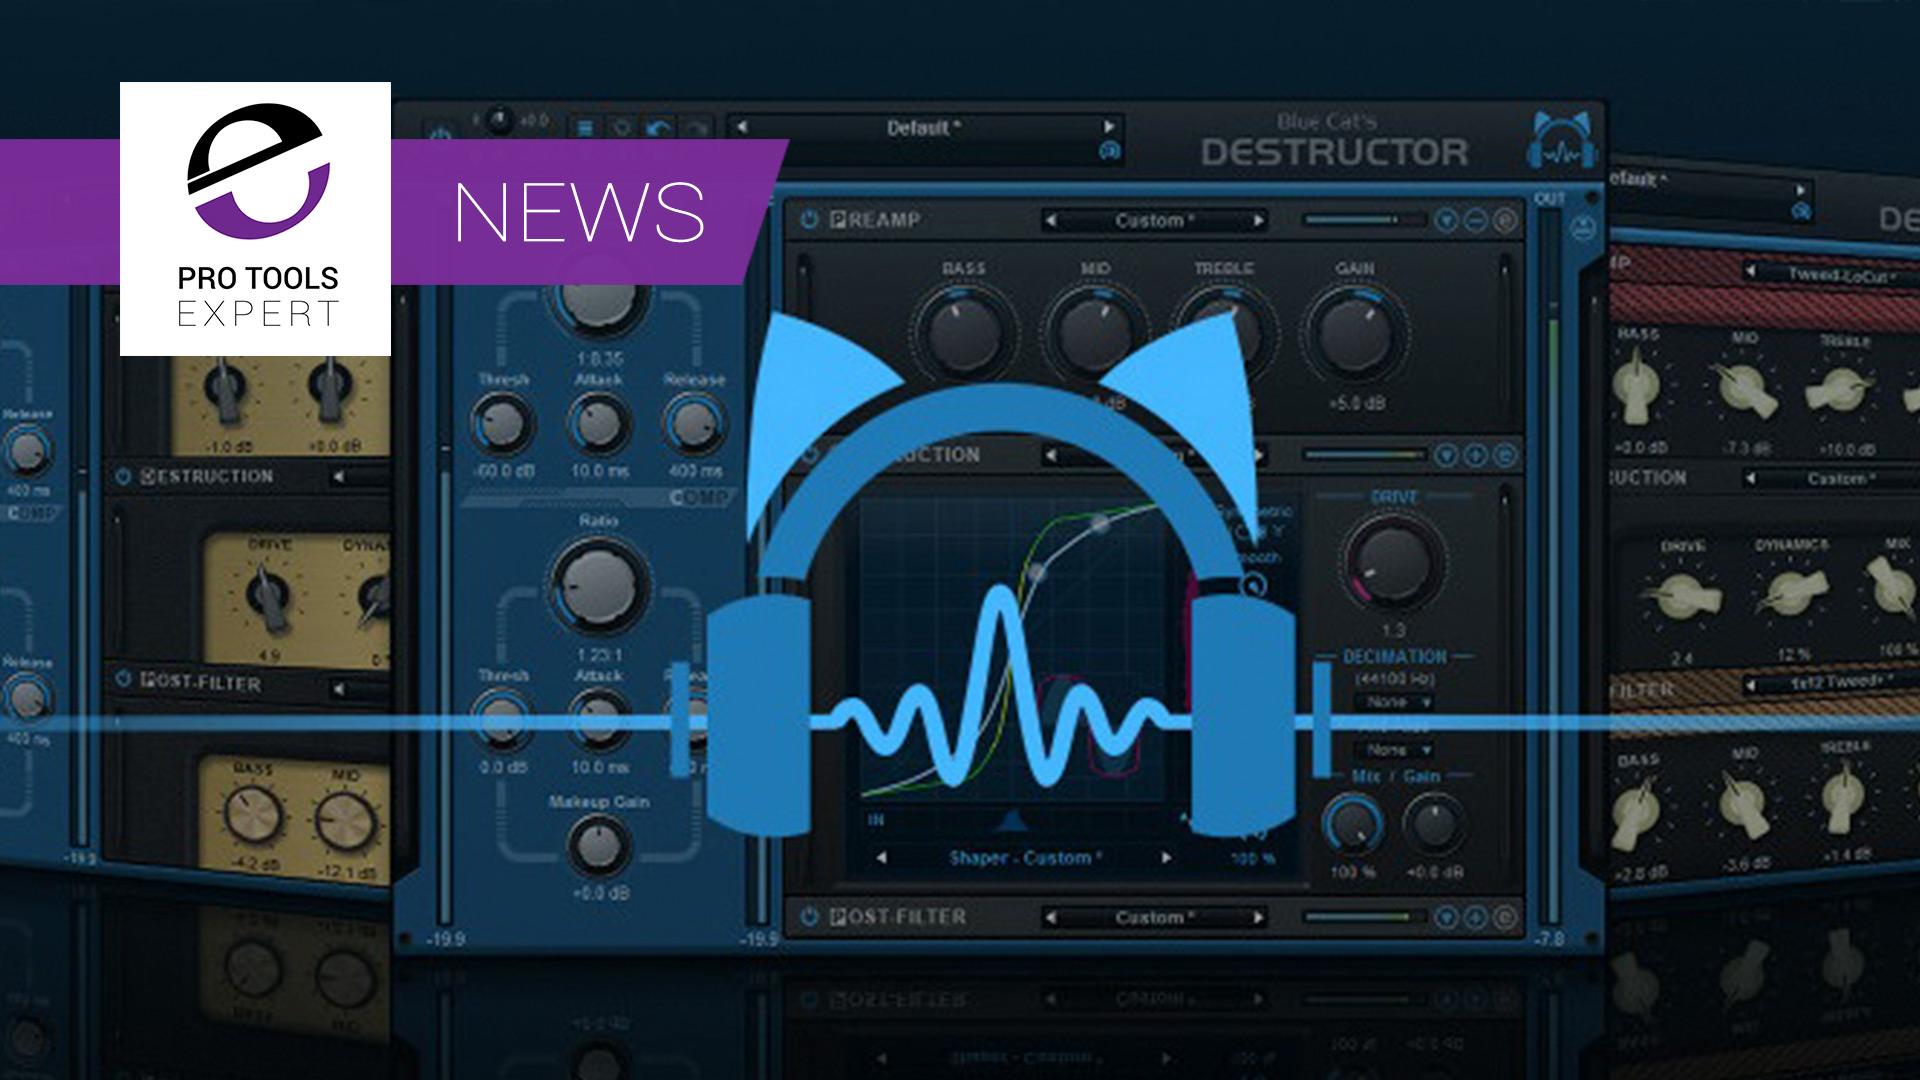 blue-cat-audio-destructor